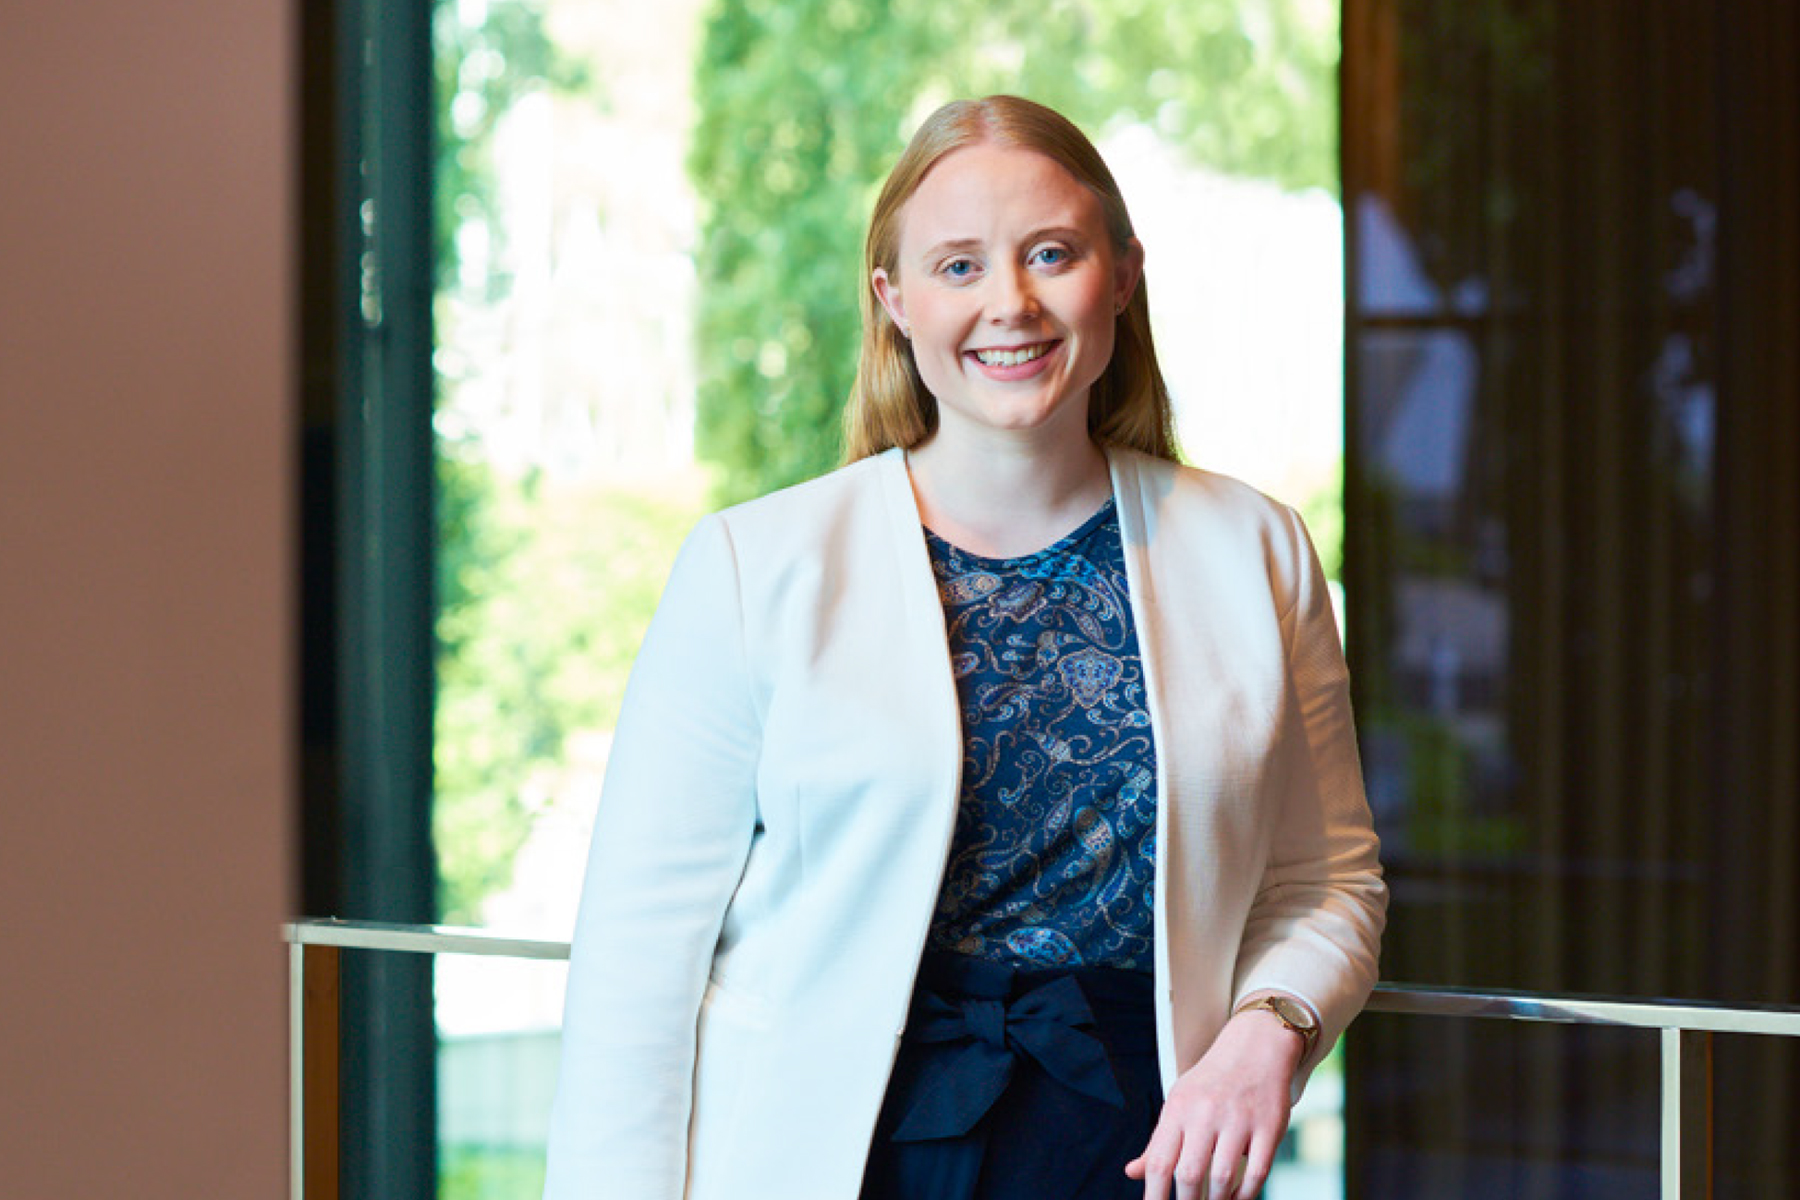 Hedda Gunnarson – Assistant, Assurance Services